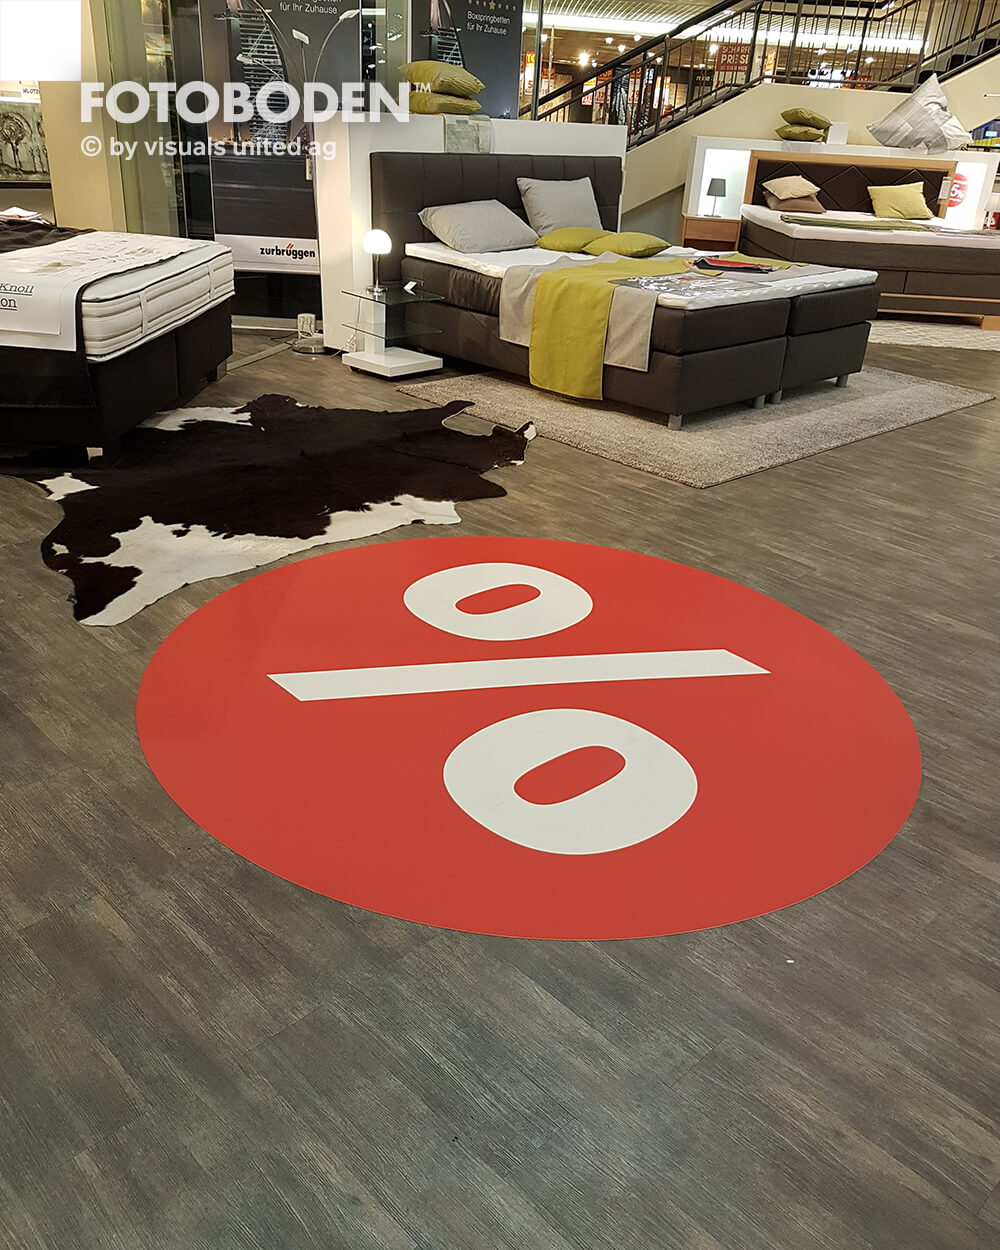 VMZB Fotoboden Flooring Fußboden Bodengestaltung Floorminder Bodendruck Werbung Fußbodenwerbung Bodenwerbung Merchandising Advertising